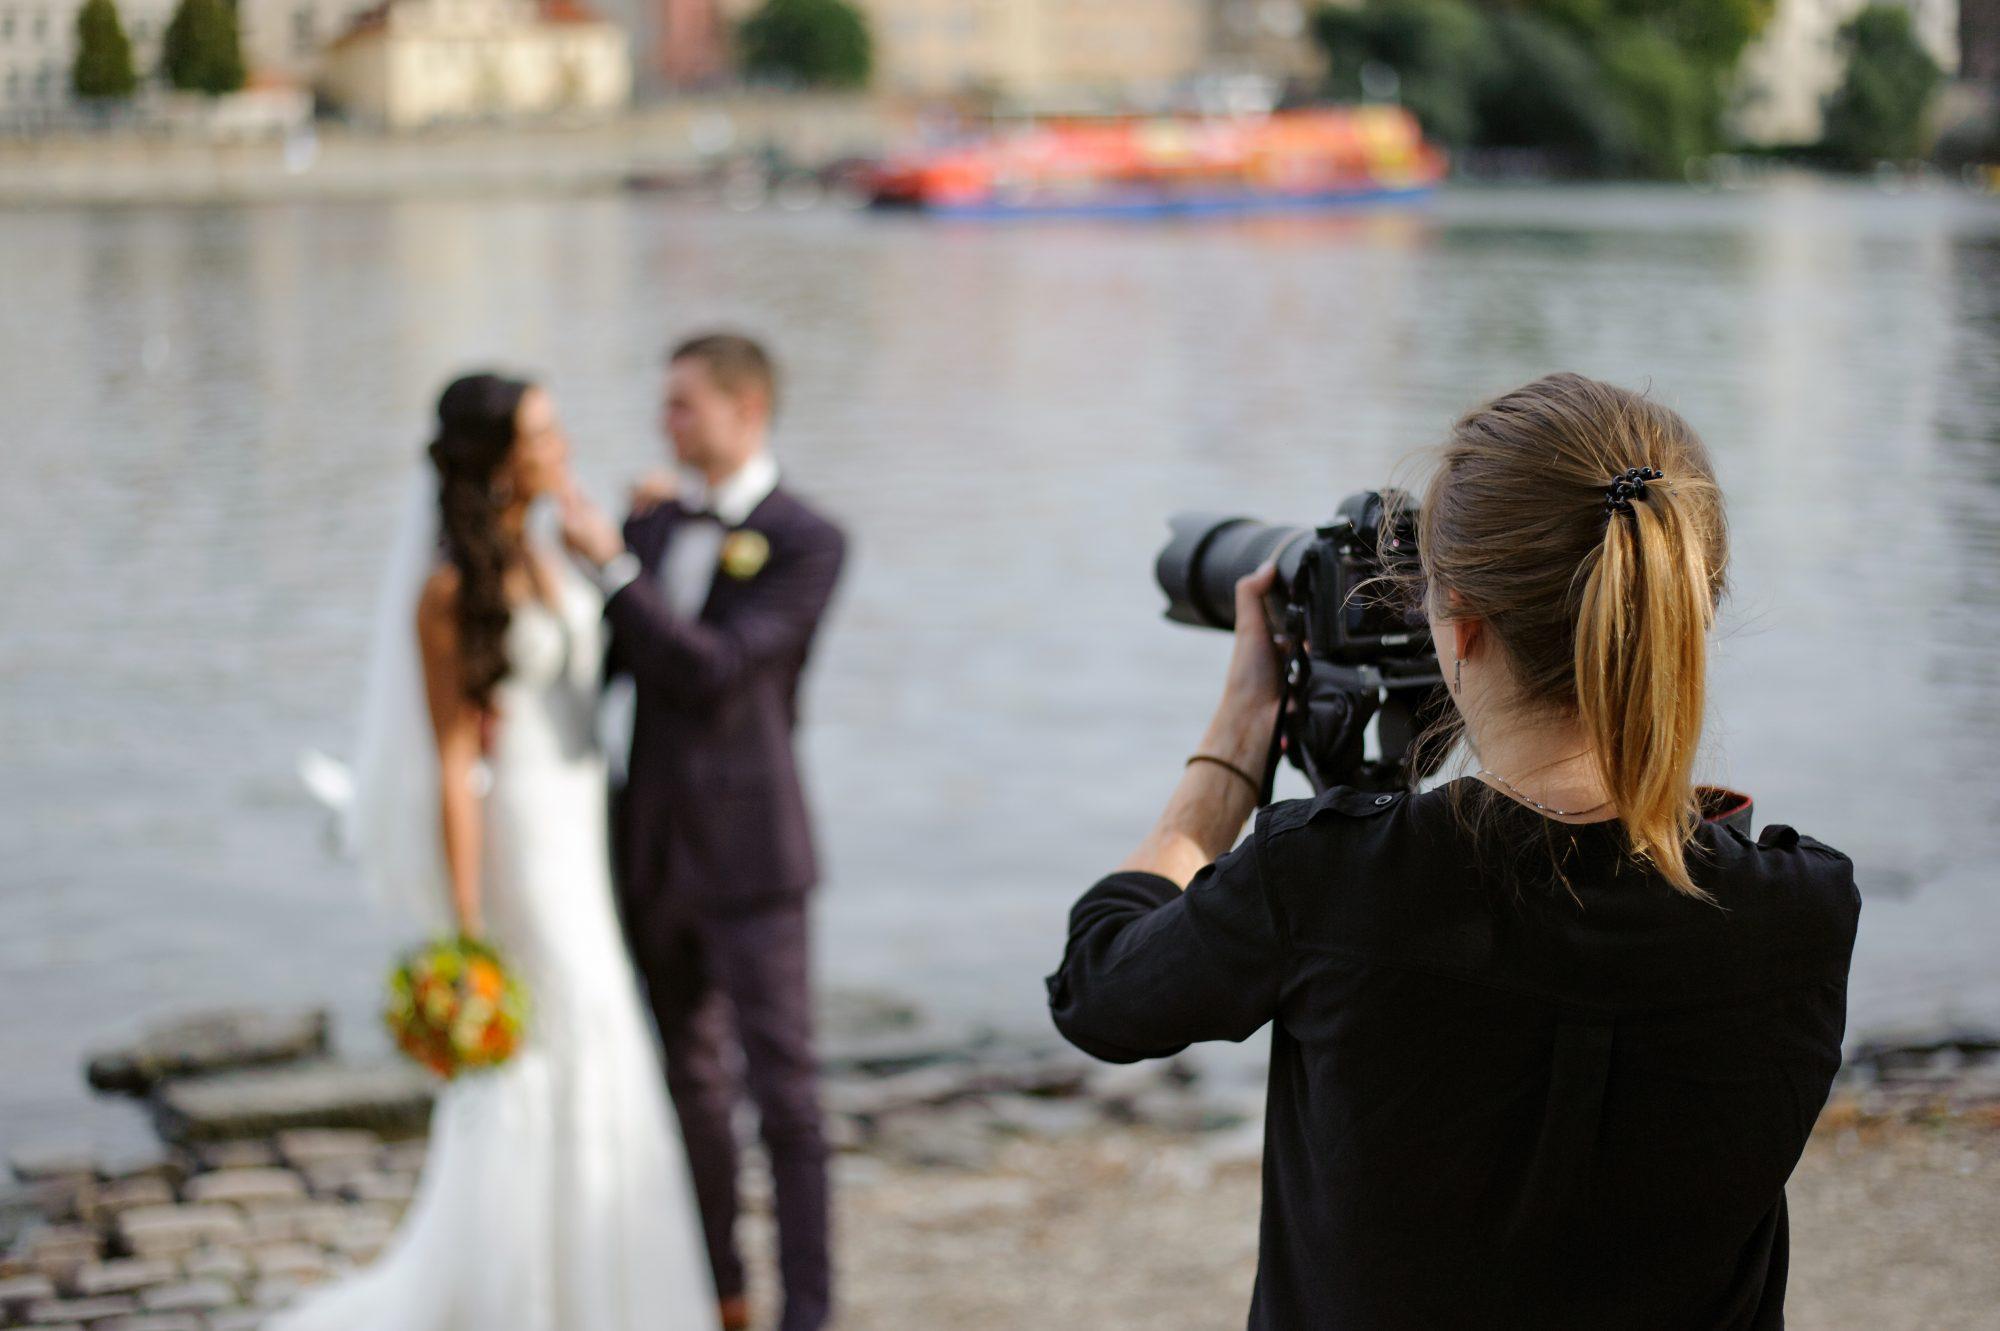 female wedding photographer shooting a wedding